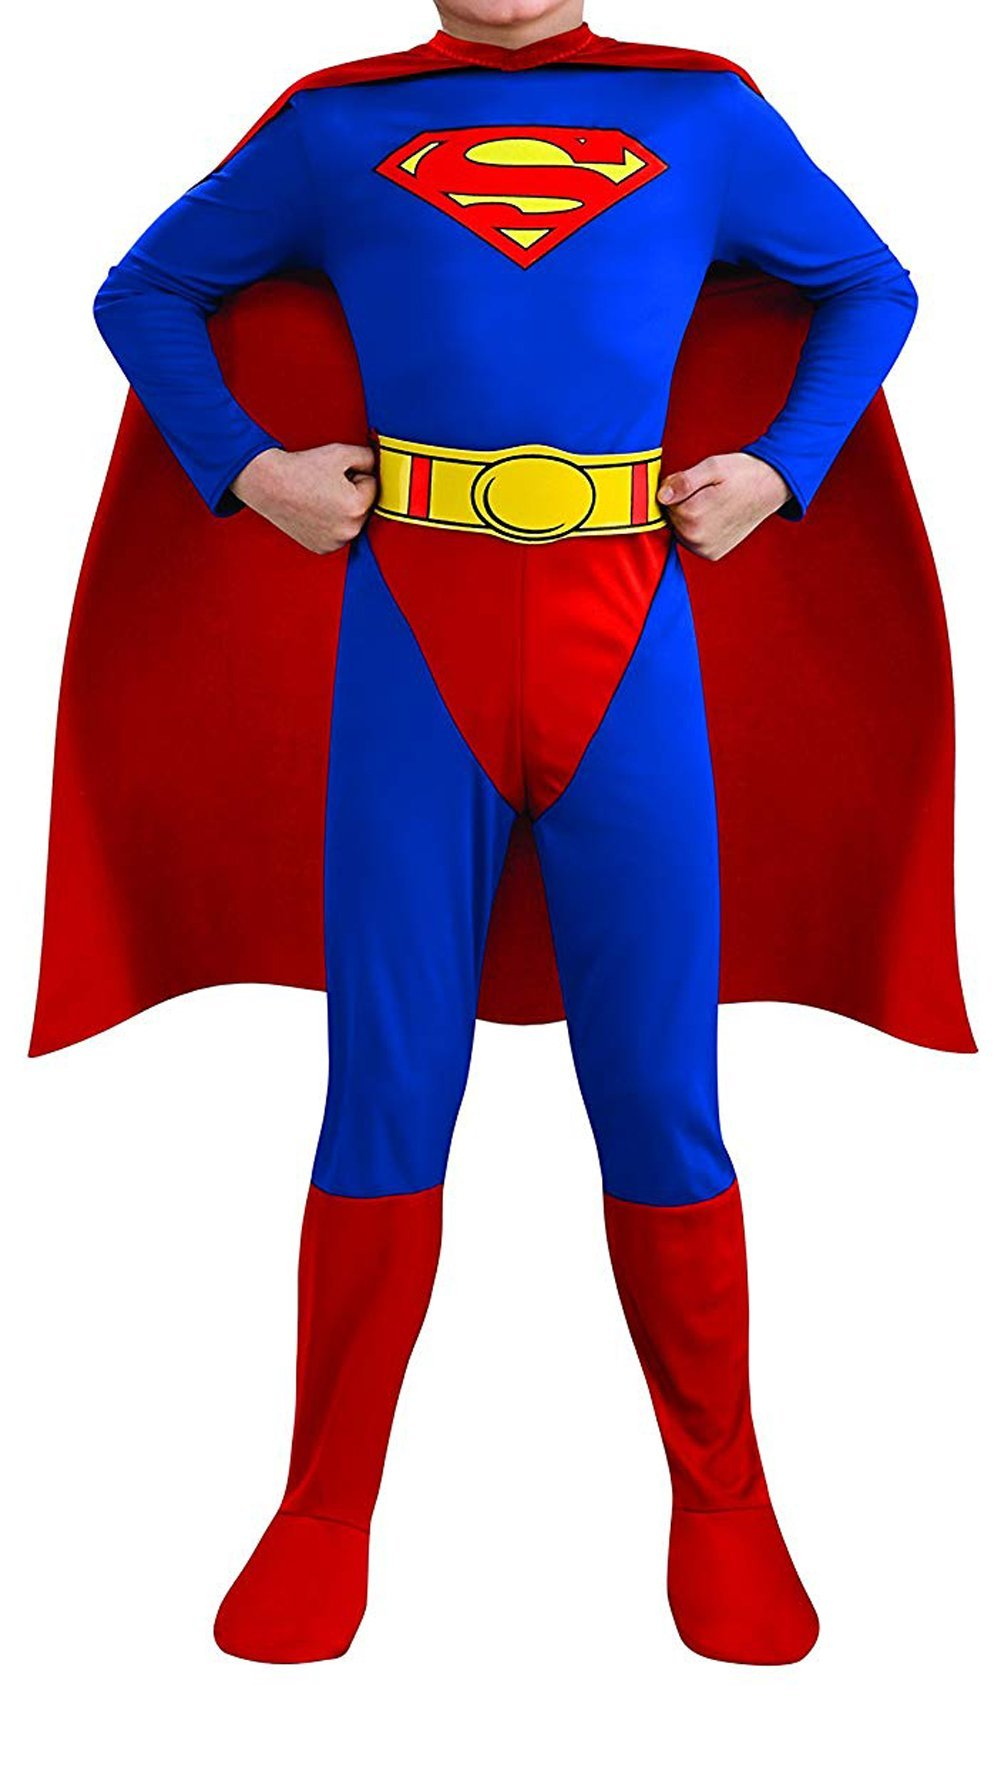 - 61 2BDJtSDd7L - Rieknic Superhero Kids Halloween Spandex Zentai Cosplay Costumes